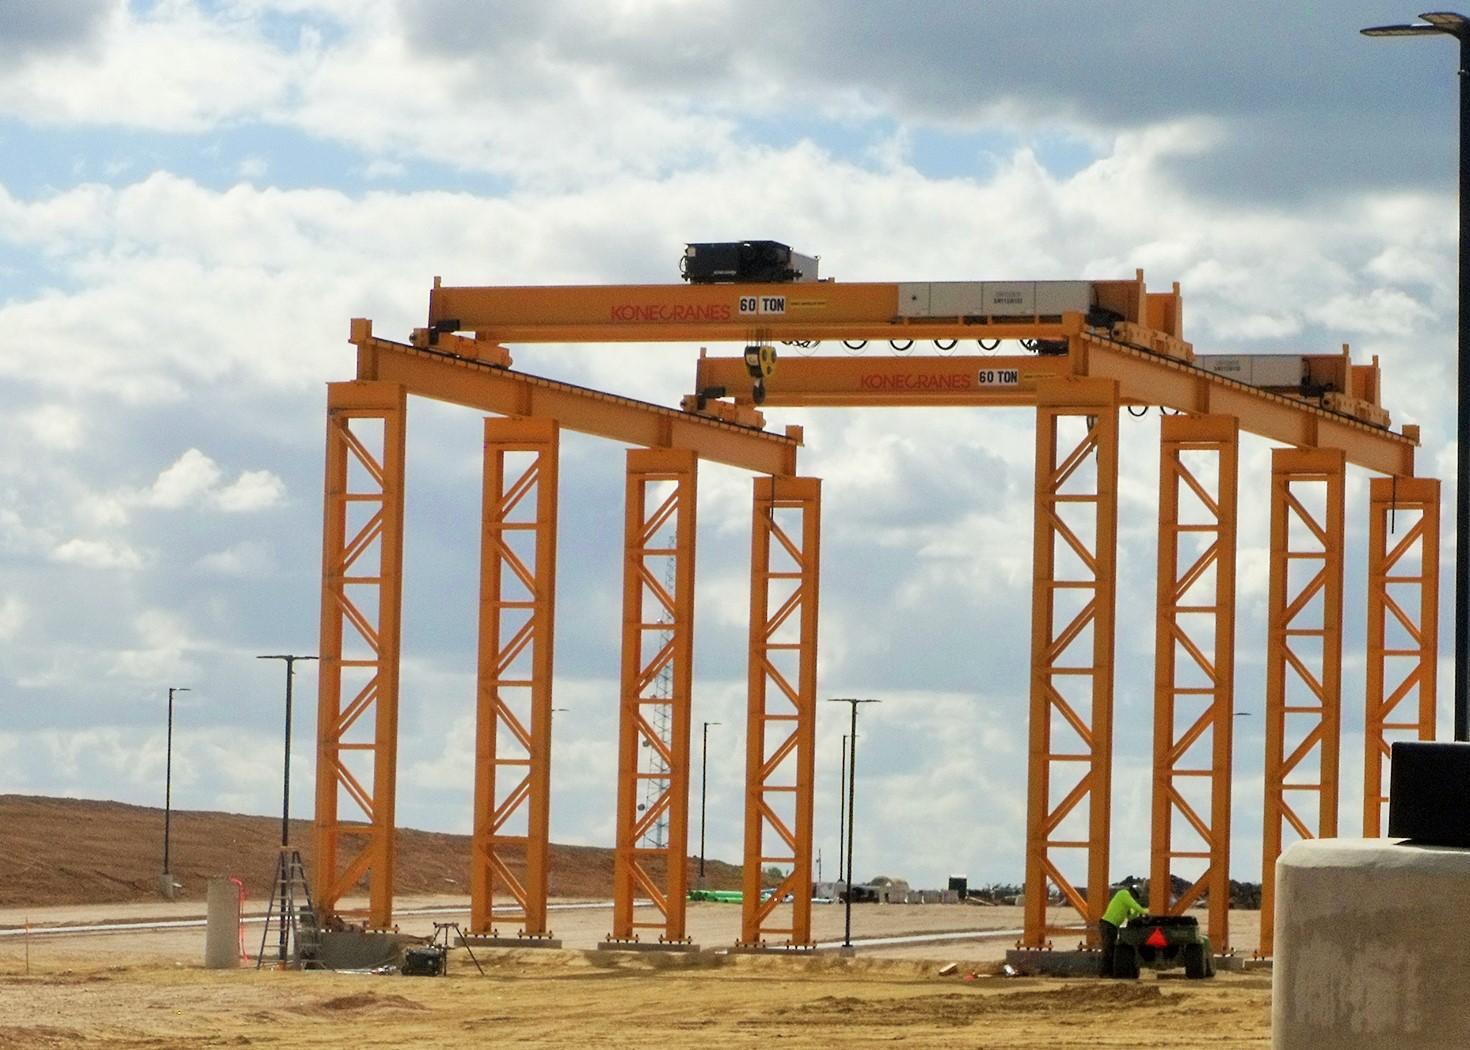 Laredo International Bridge Cameras - The Camera